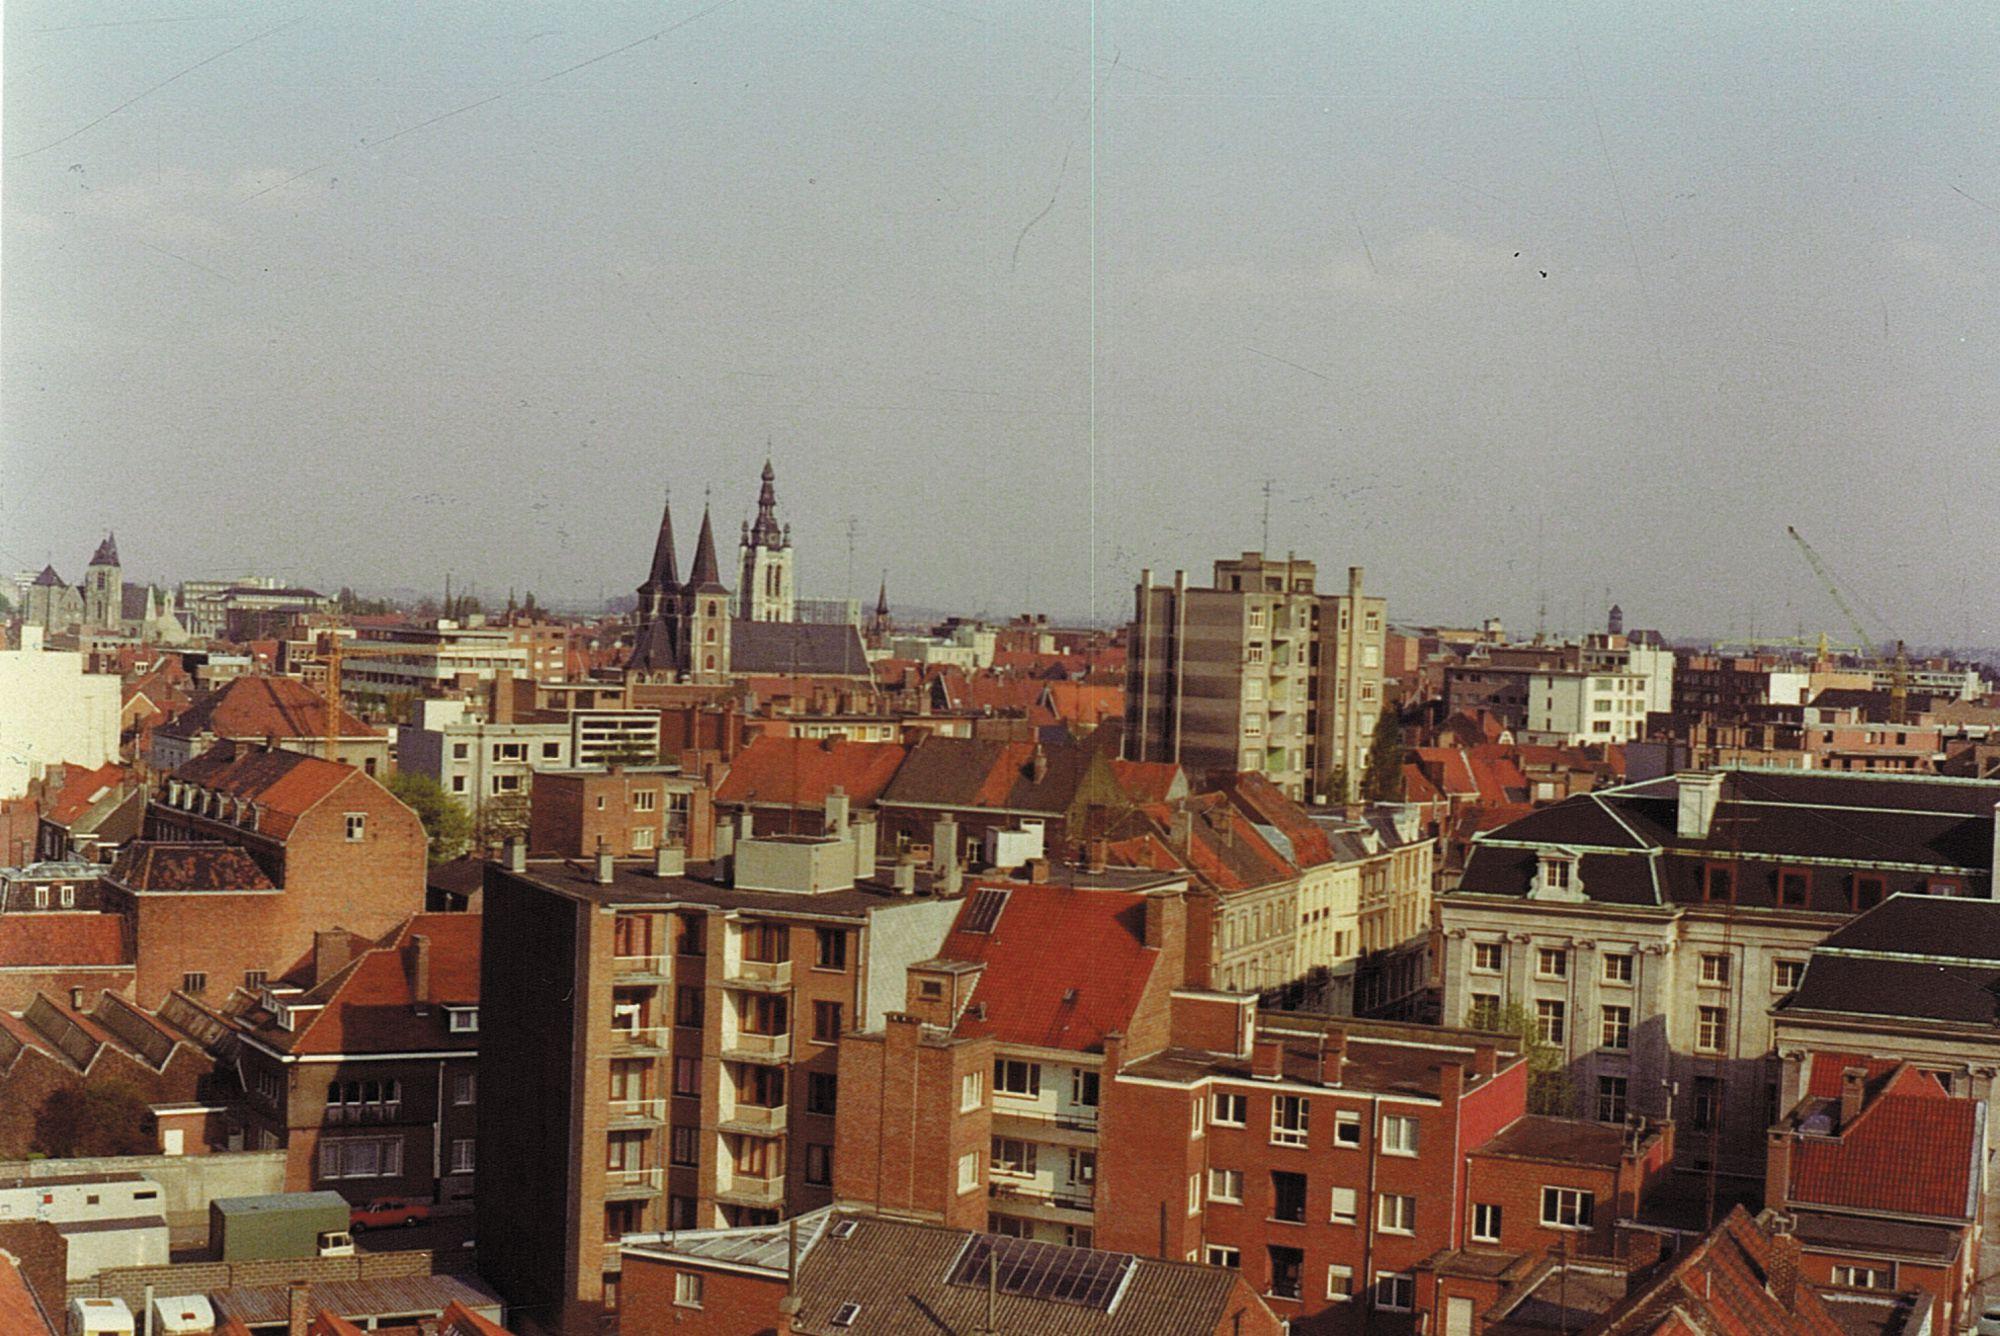 Luchtfoto Kortrijkse binnenstad